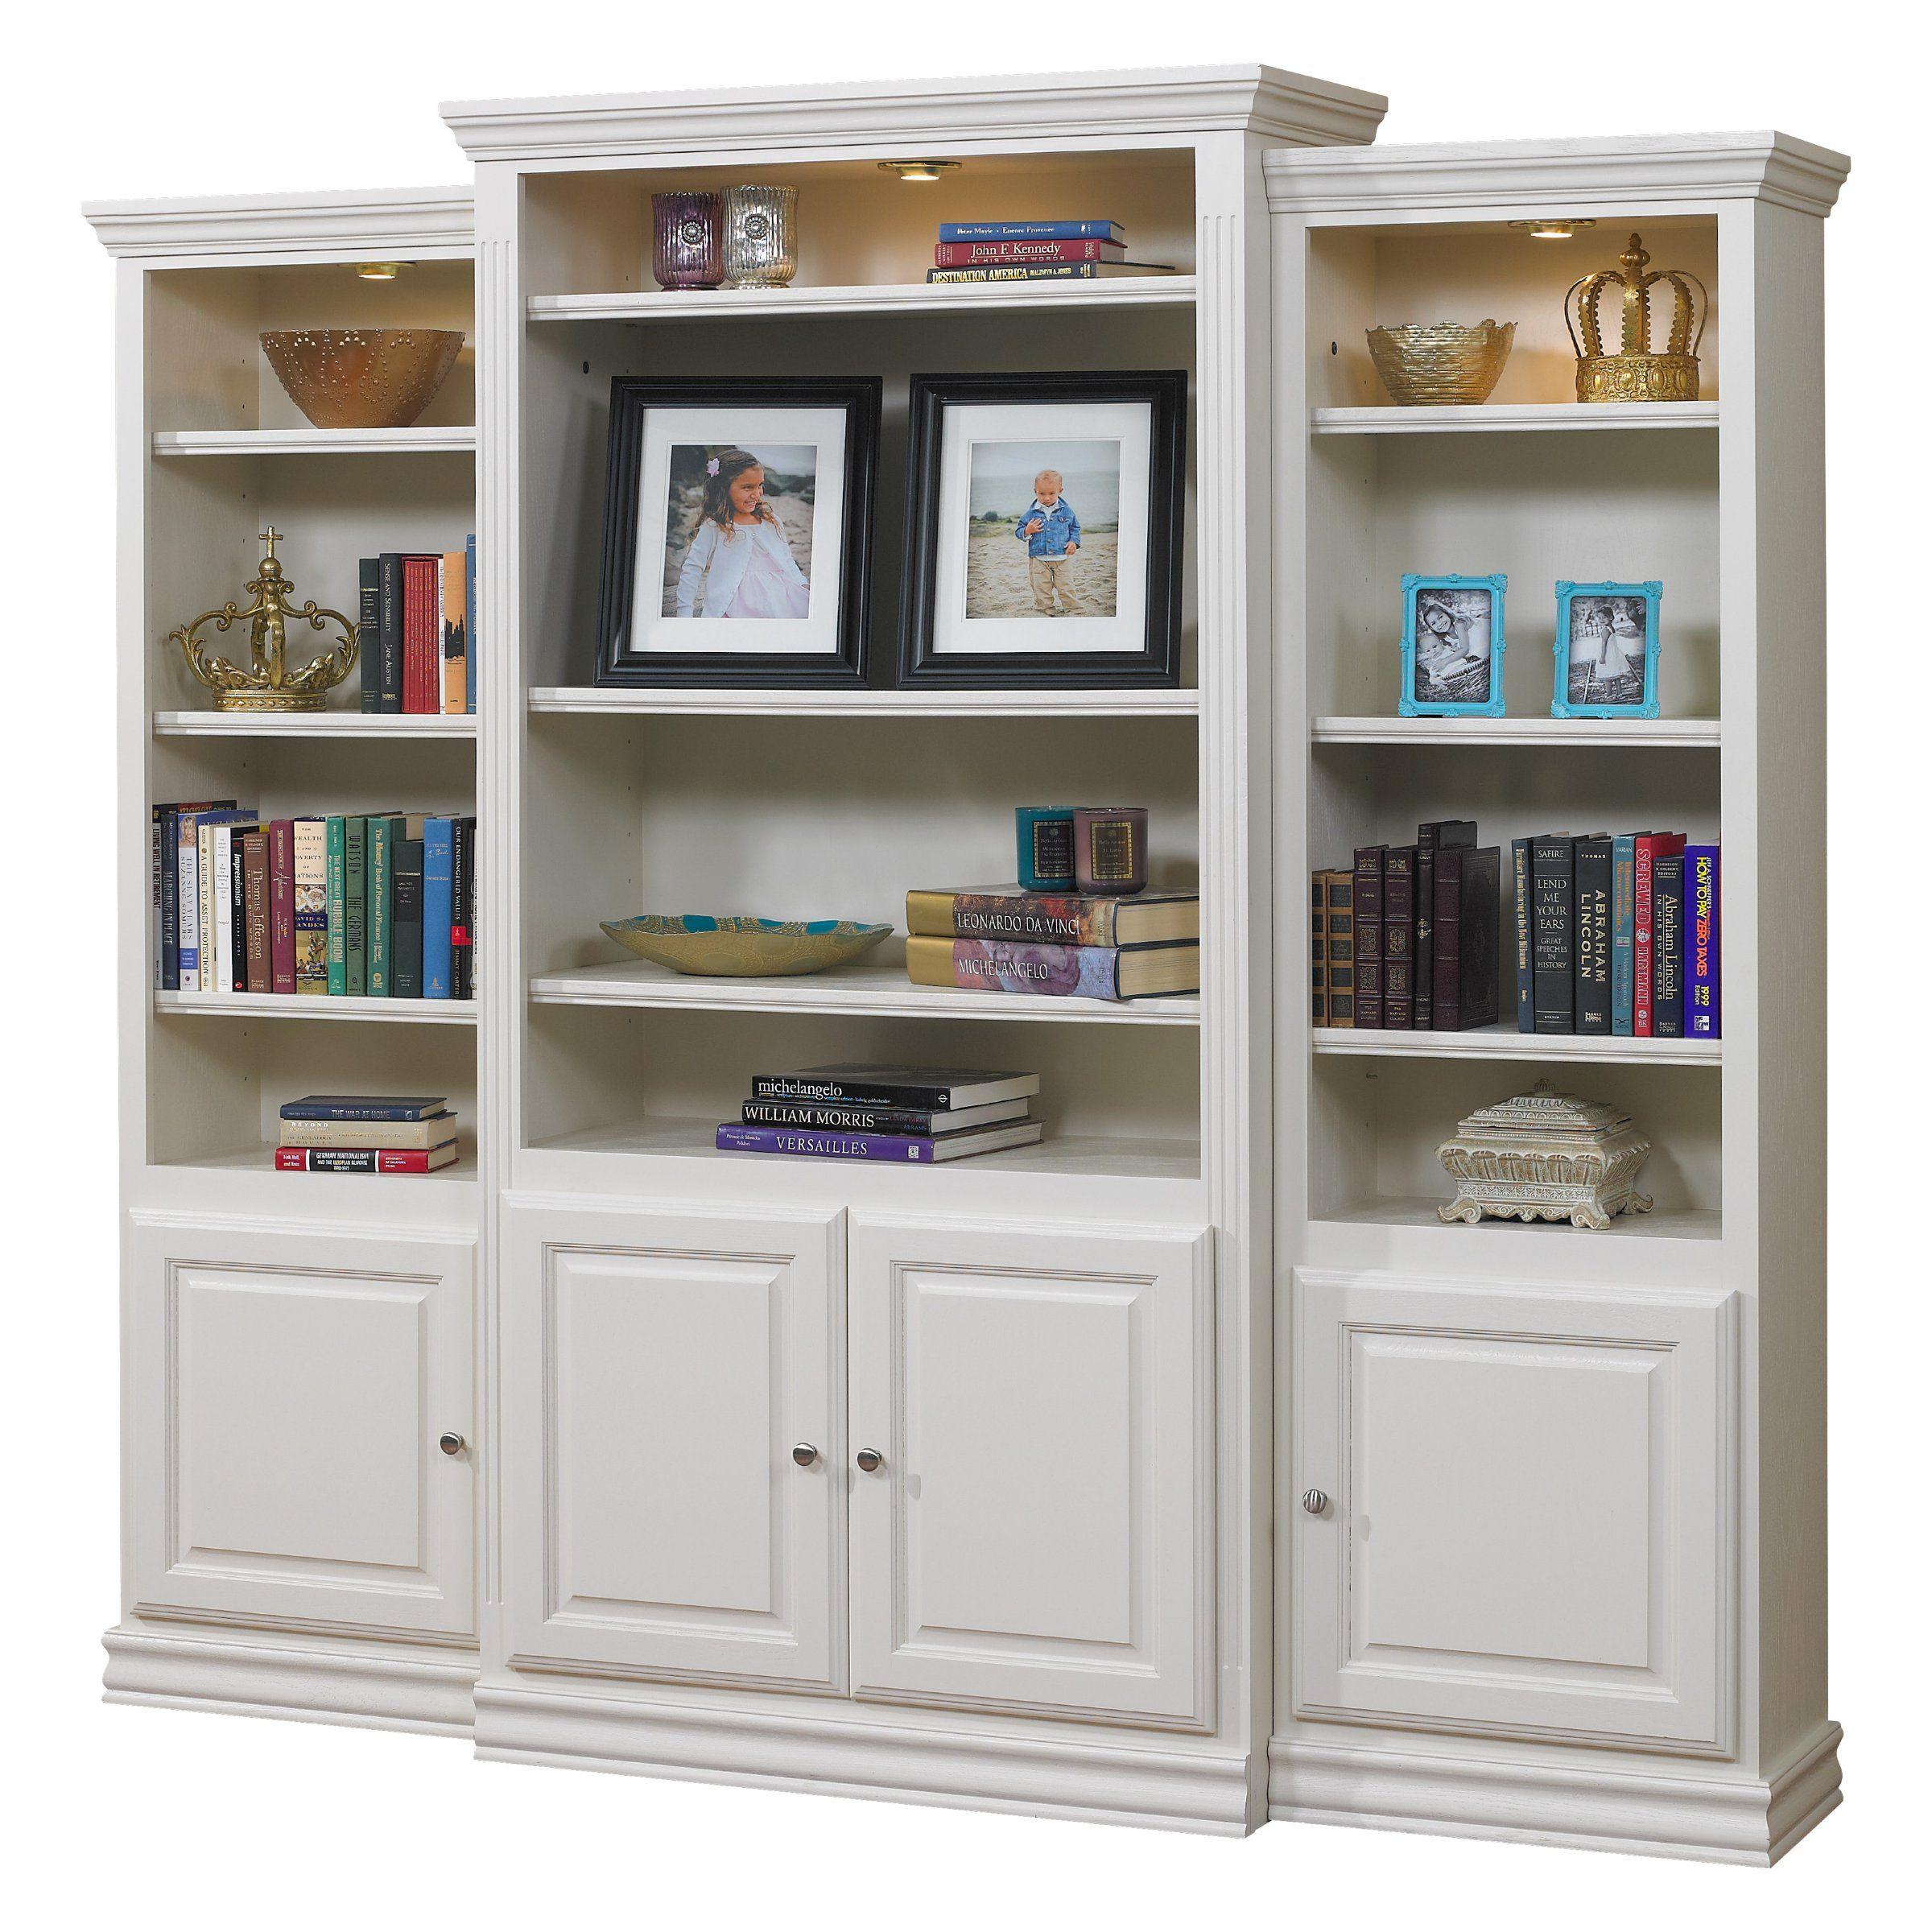 a & e kamran wall bookcase pearl white A & E Kamran Wall Bookcase   Pearl White   Bookcases at Hayneedle  a & e kamran wall bookcase pearl white